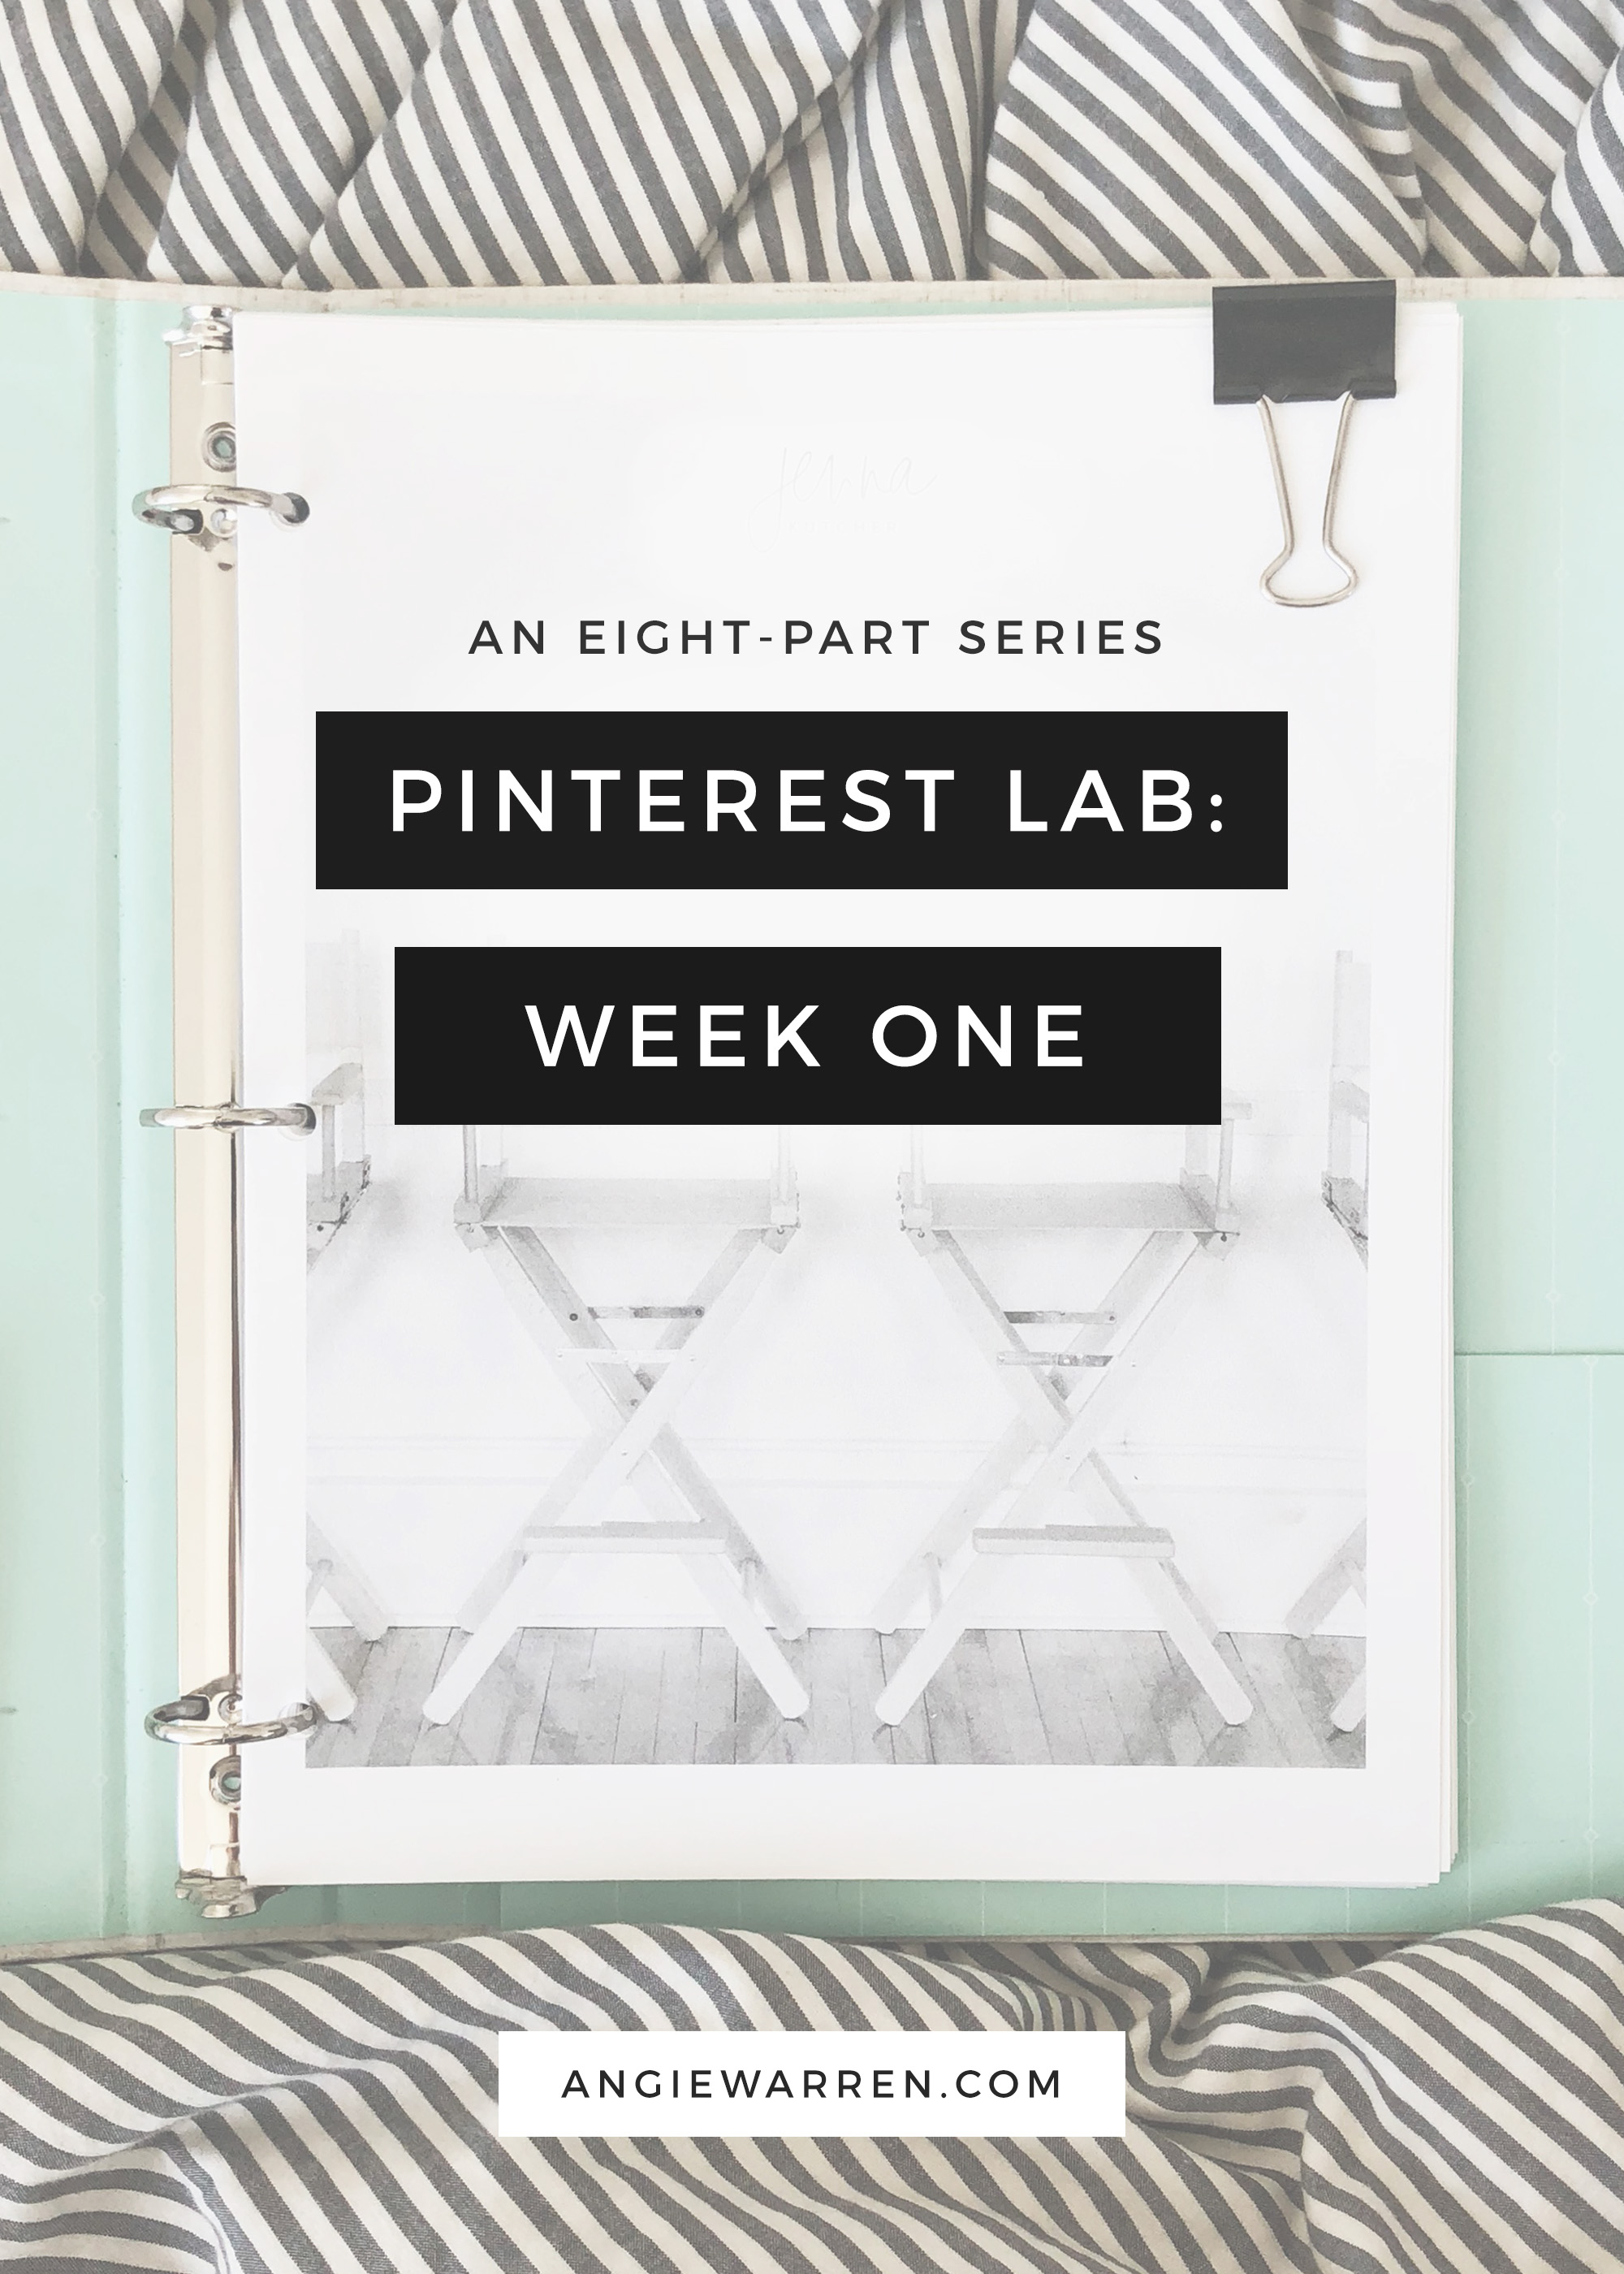 The Pinterest Lab - a Series - Angie Warren - www.angiewarren.com